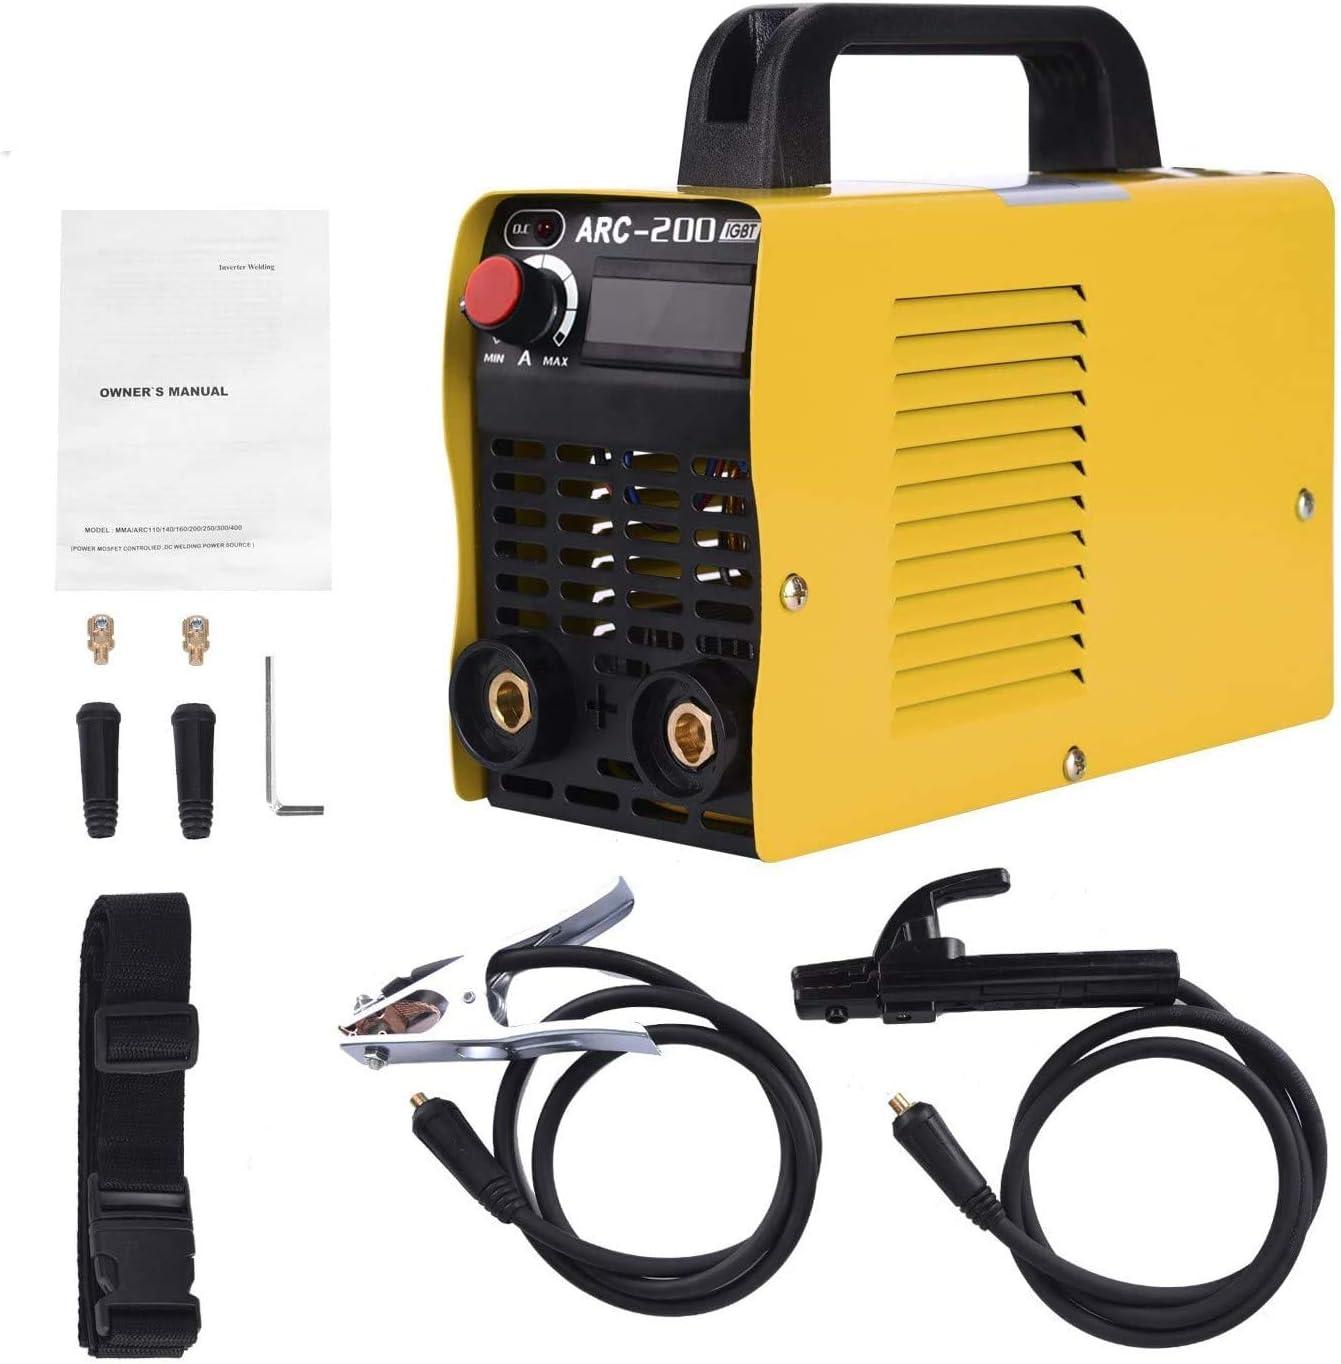 Welding Machine, 110V Plug, 200Amp Power, IGBT AC DC Beginner Welder With Display LCD Use Welding Rod Equipment Tools Accessories